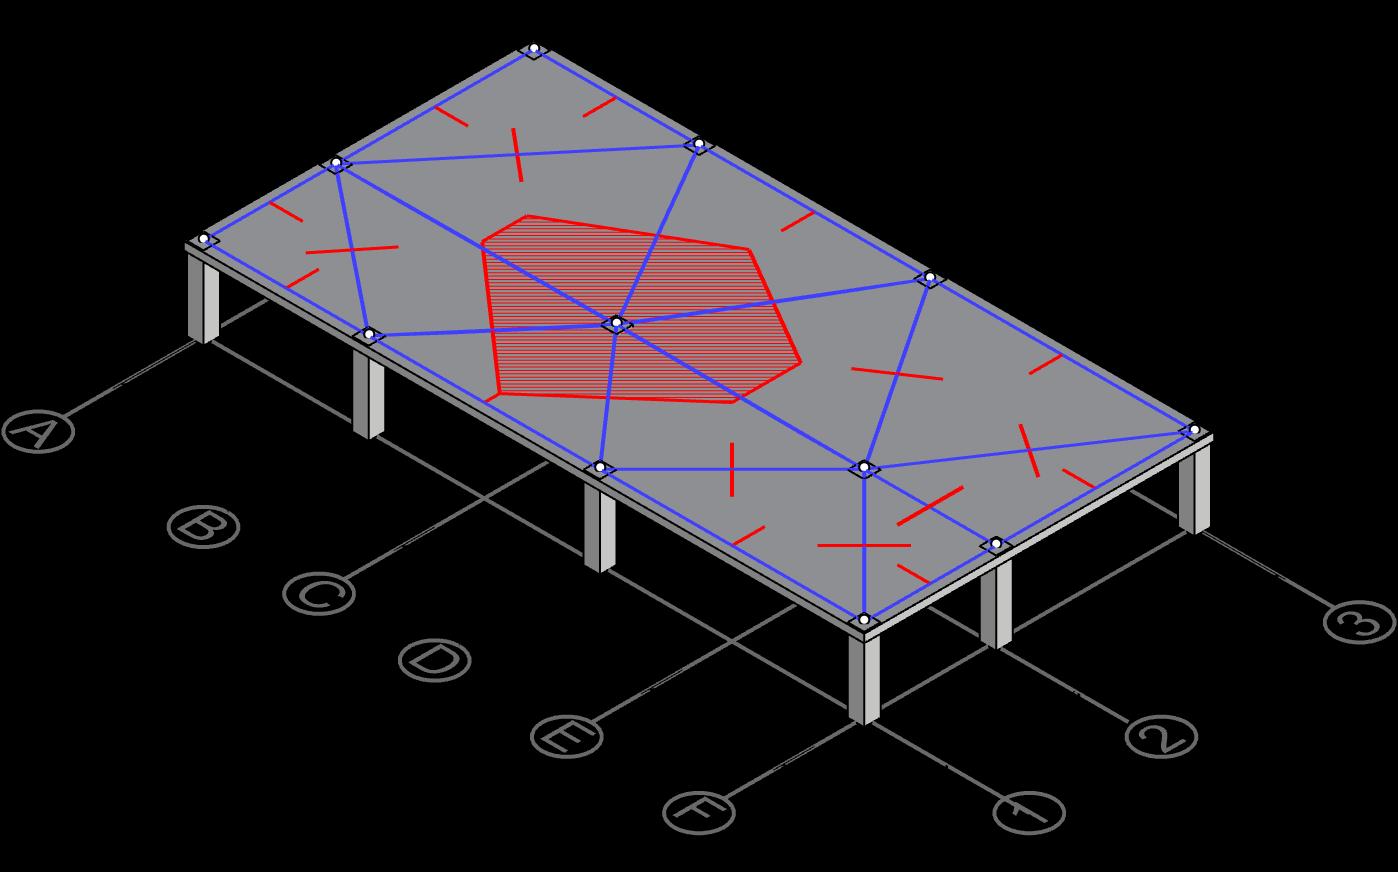 Derive centerline polygon for column C-2